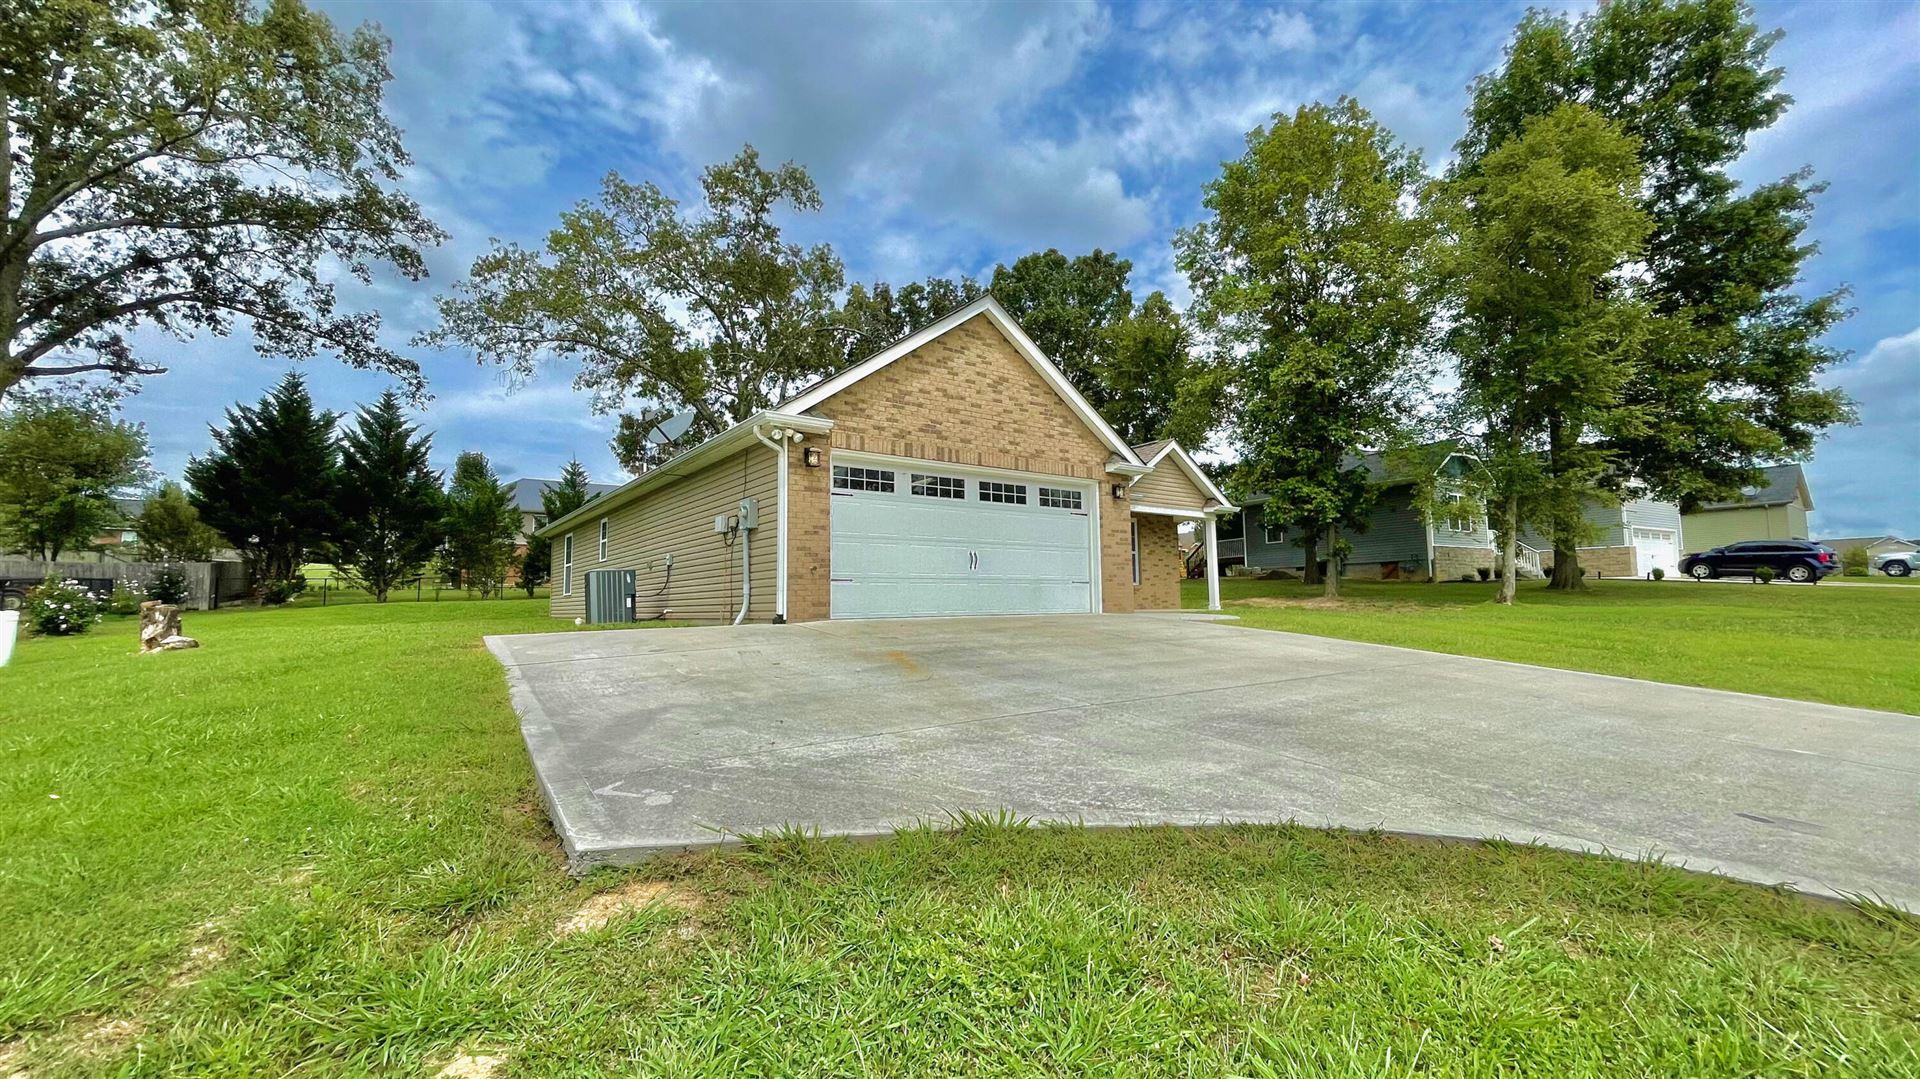 Photo of 740 Wade Rd, Seymour, TN 37865 (MLS # 1166067)